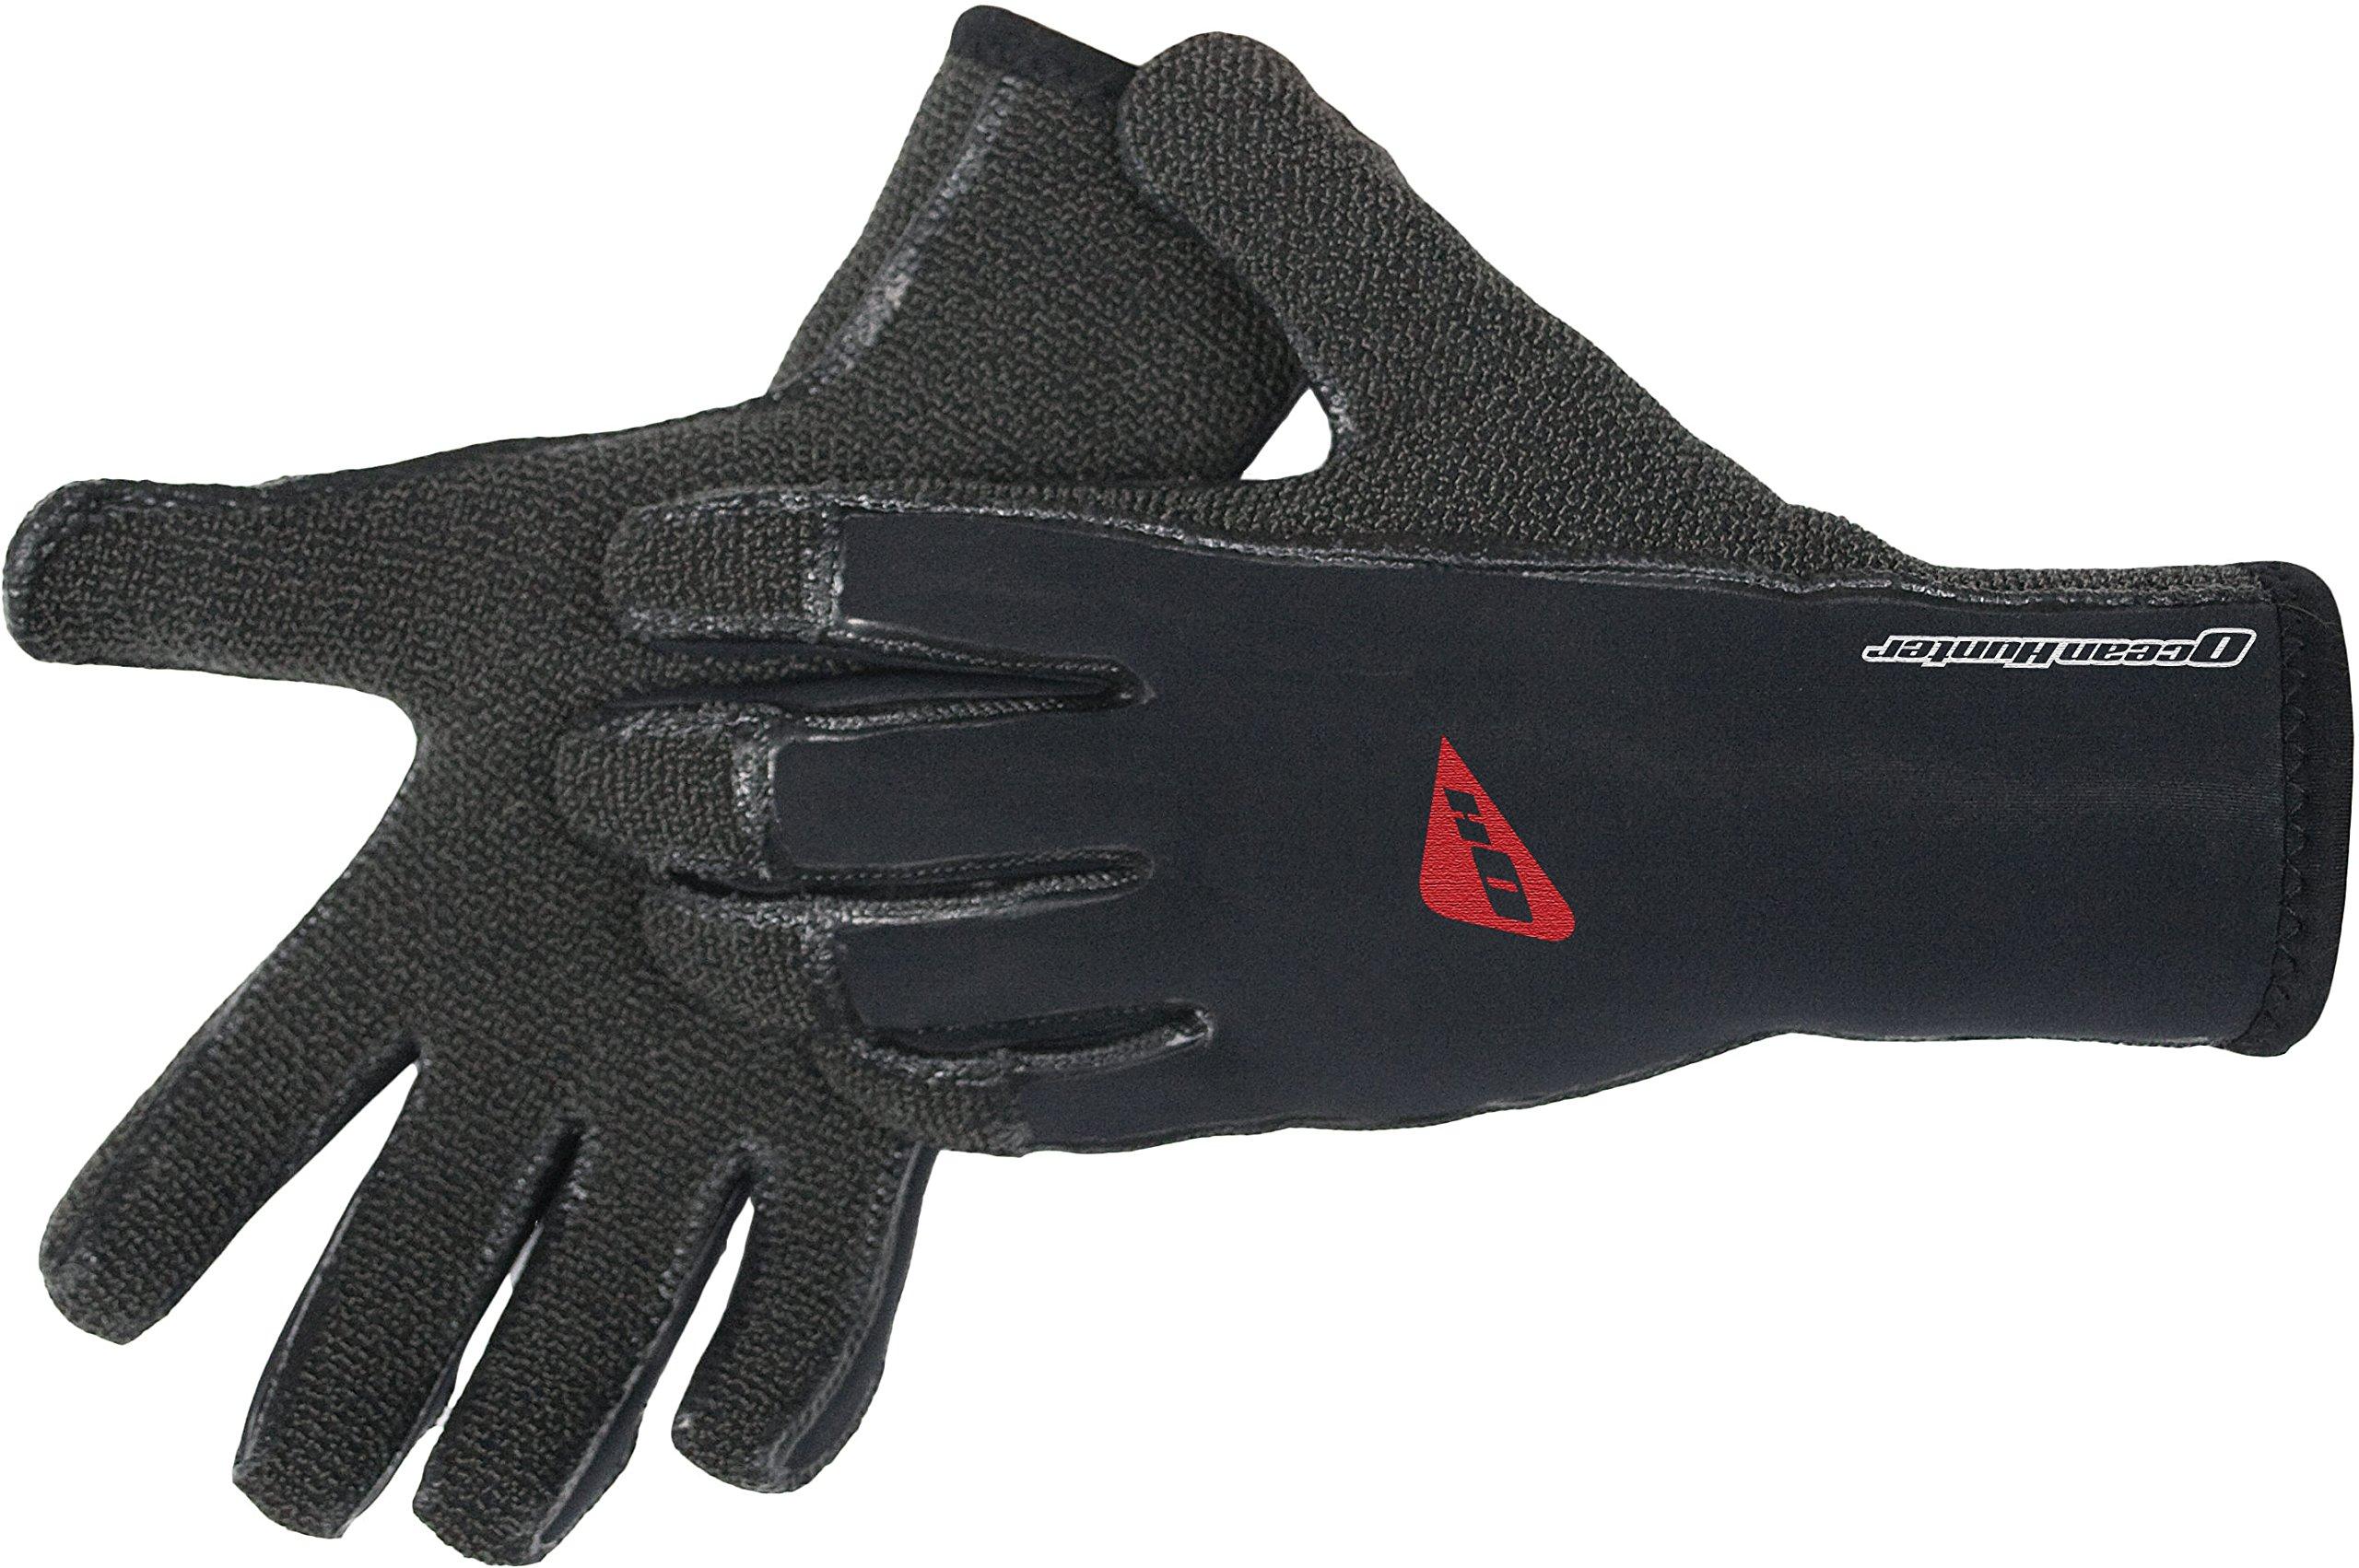 Ocean Hunter Strike Kevlar Glove, XS by Ocean Hunter